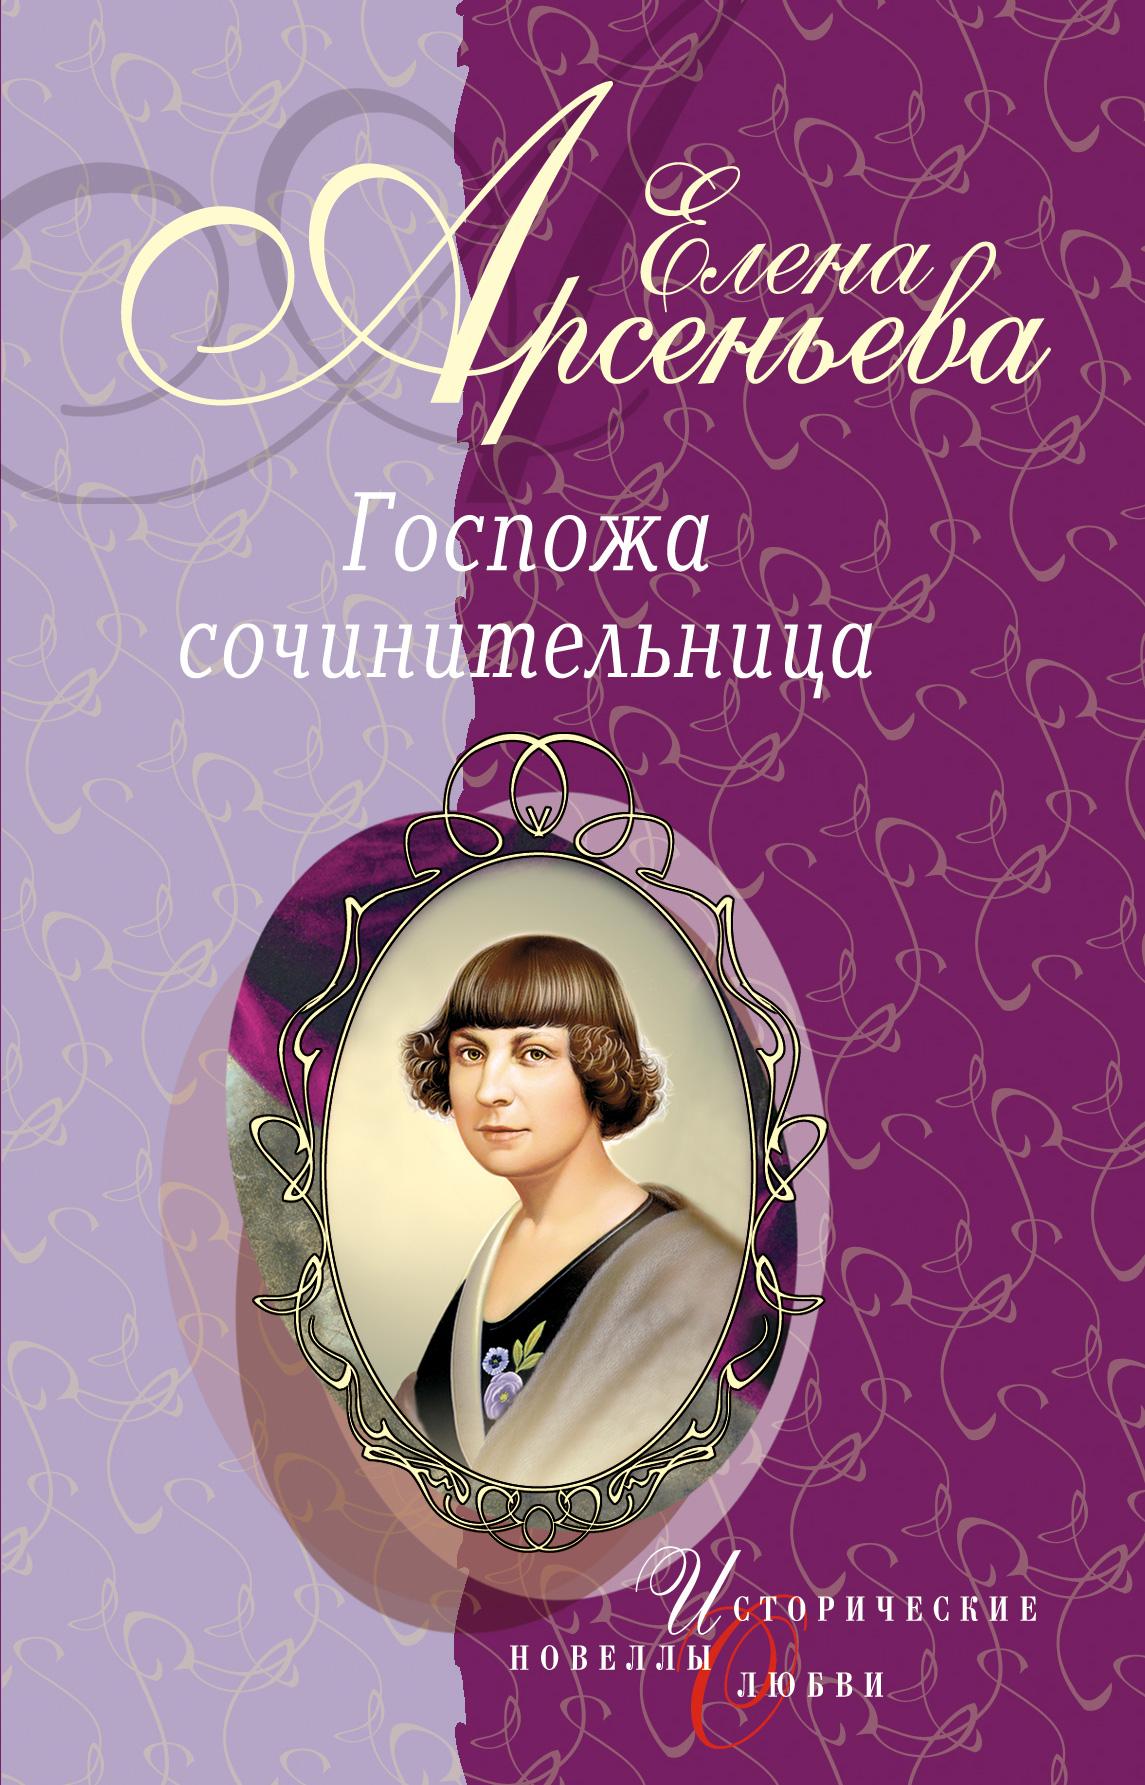 Елена Арсеньева Сильфида, ведьма, сатанесса (Зинаида Гиппиус)